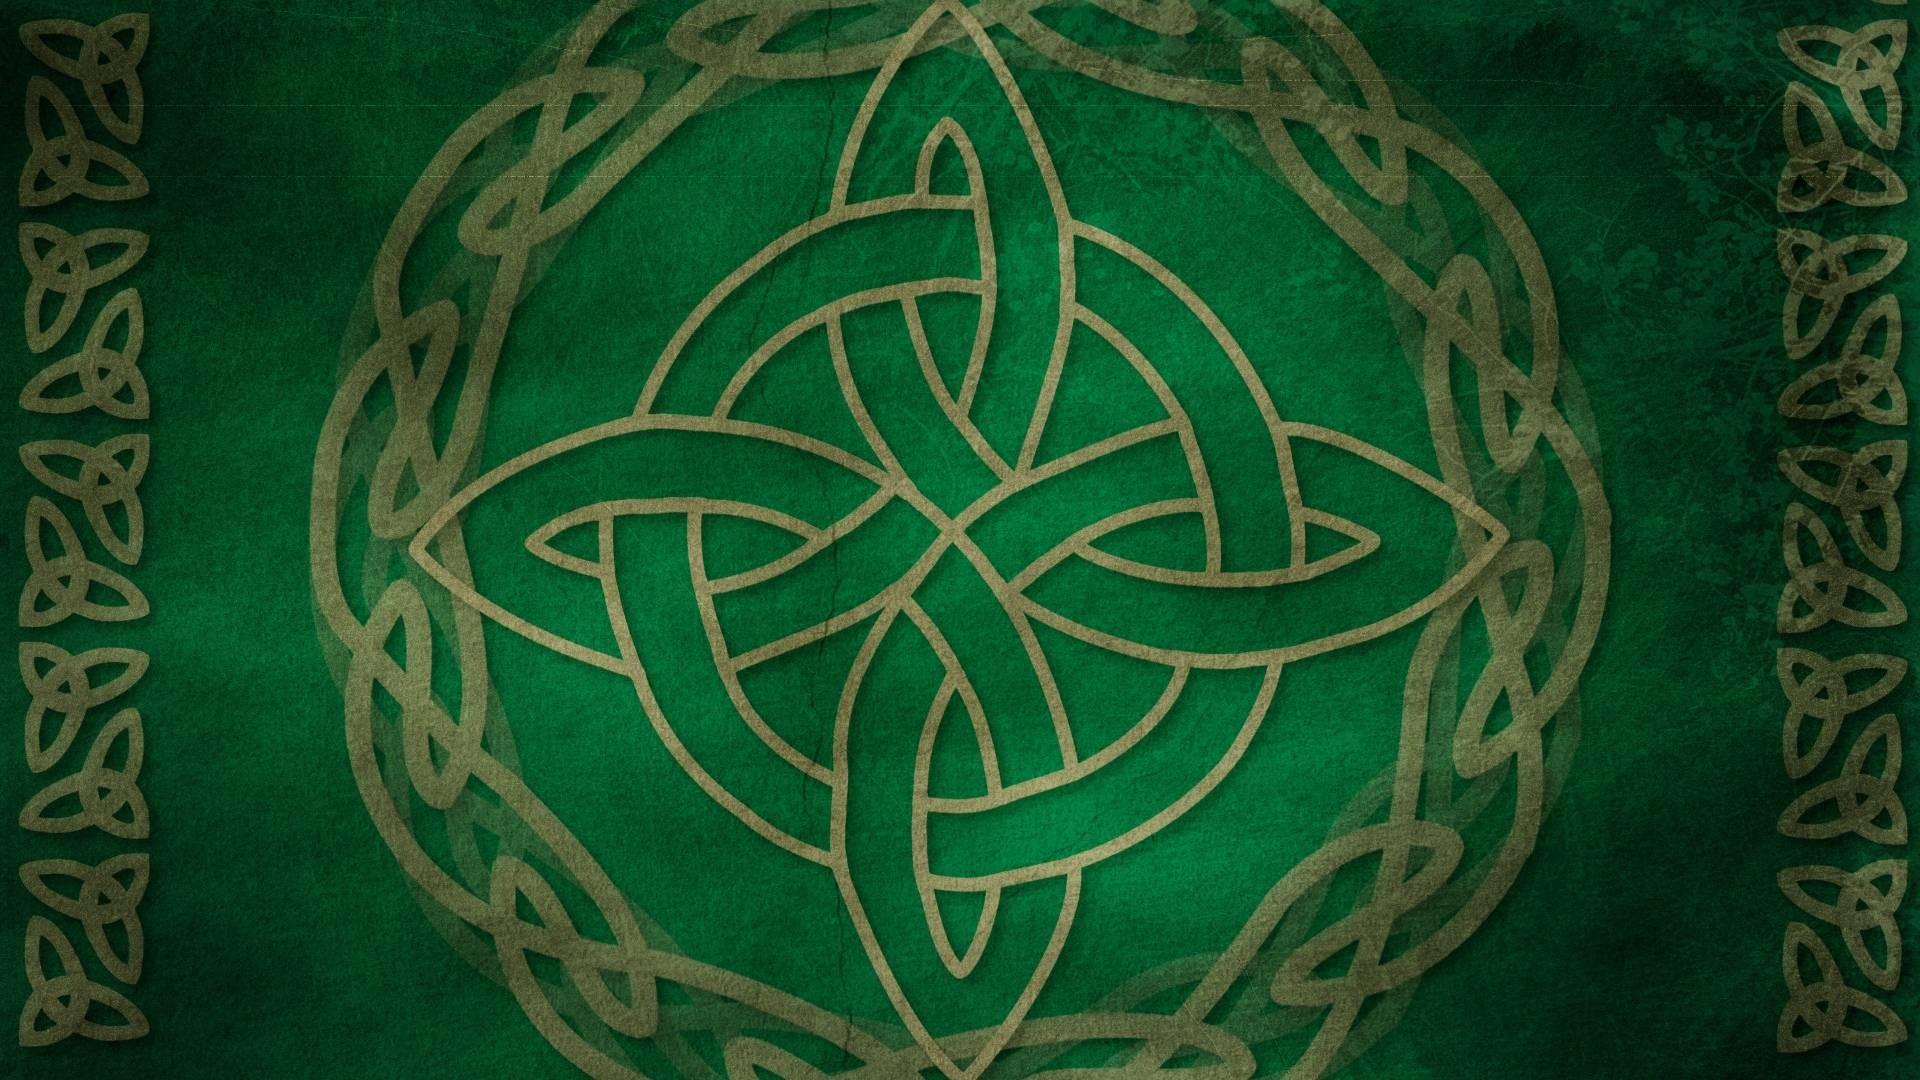 Celtic Knot Wallpaper 42 Images